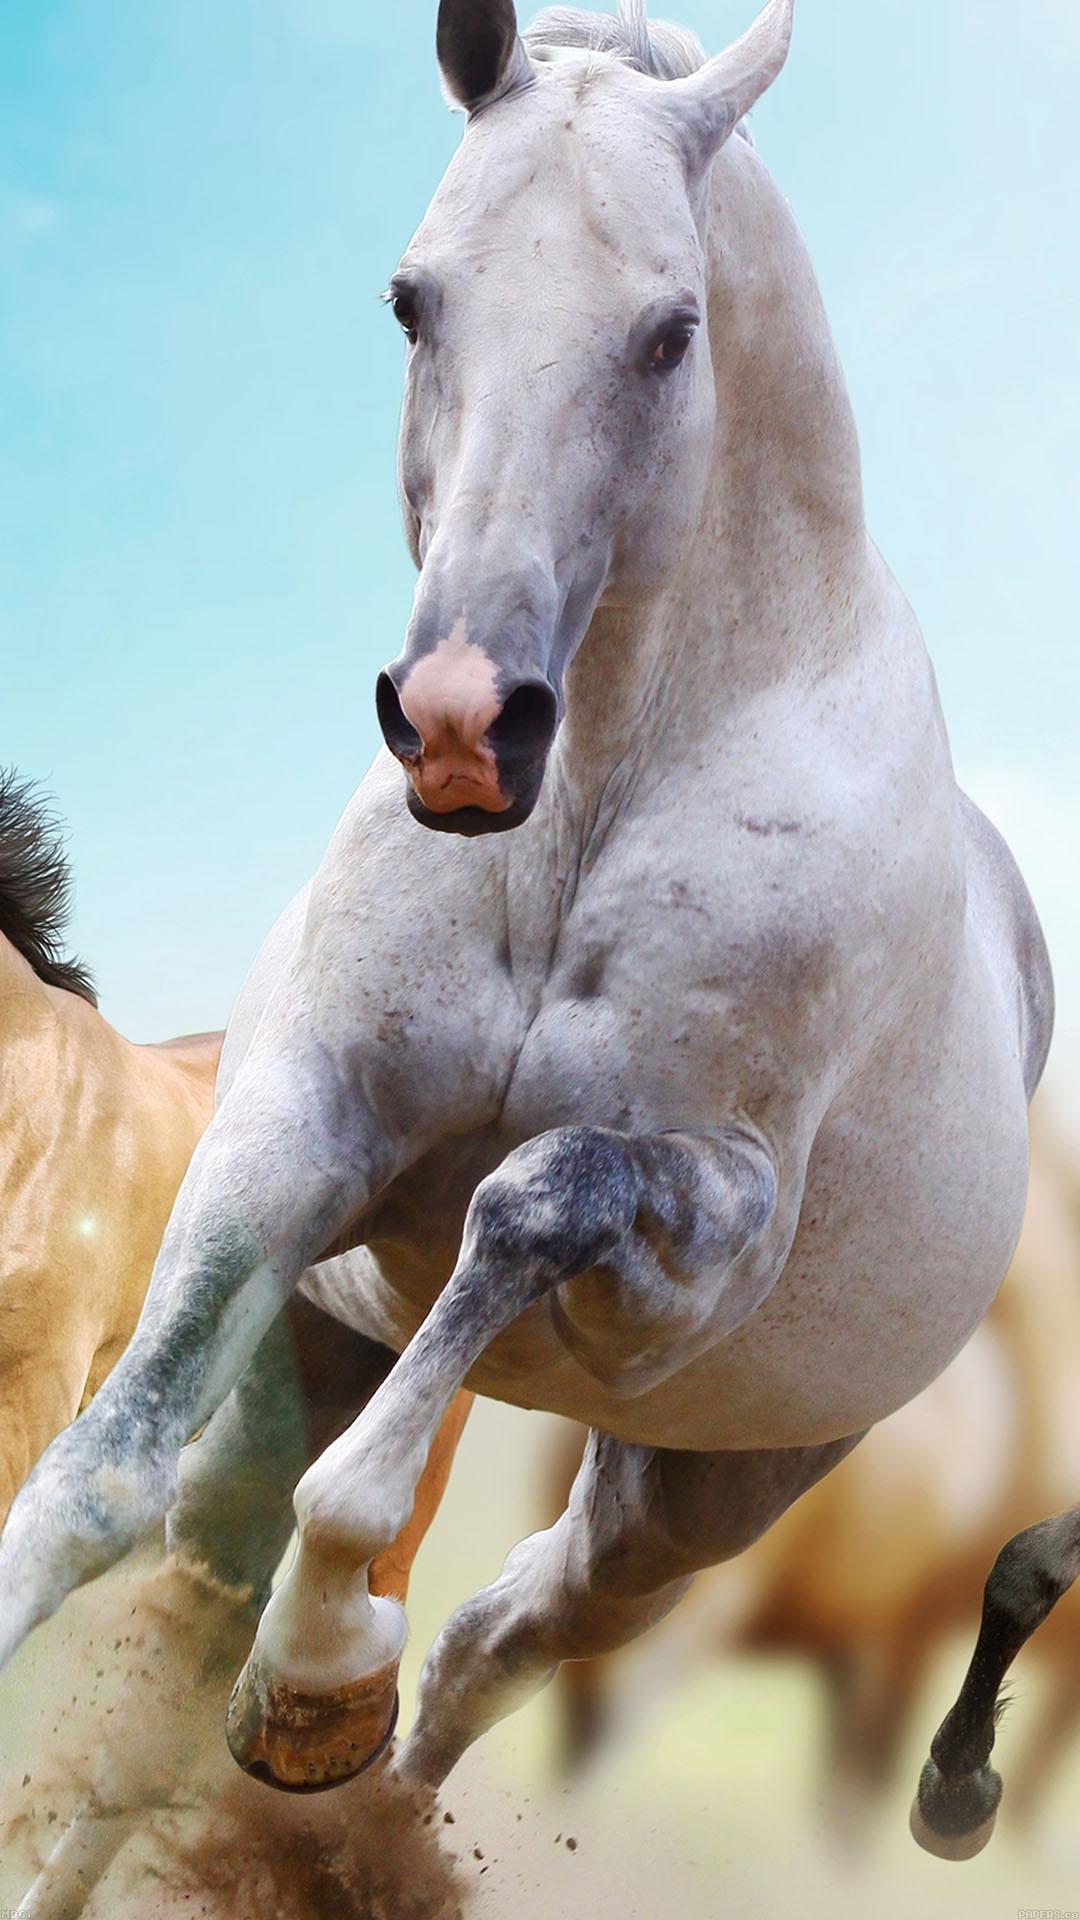 Horses Run 3Wallpapers iPhone Parallax 3Wallpapers : notre sélection de fonds d'écran du 08/12/2016